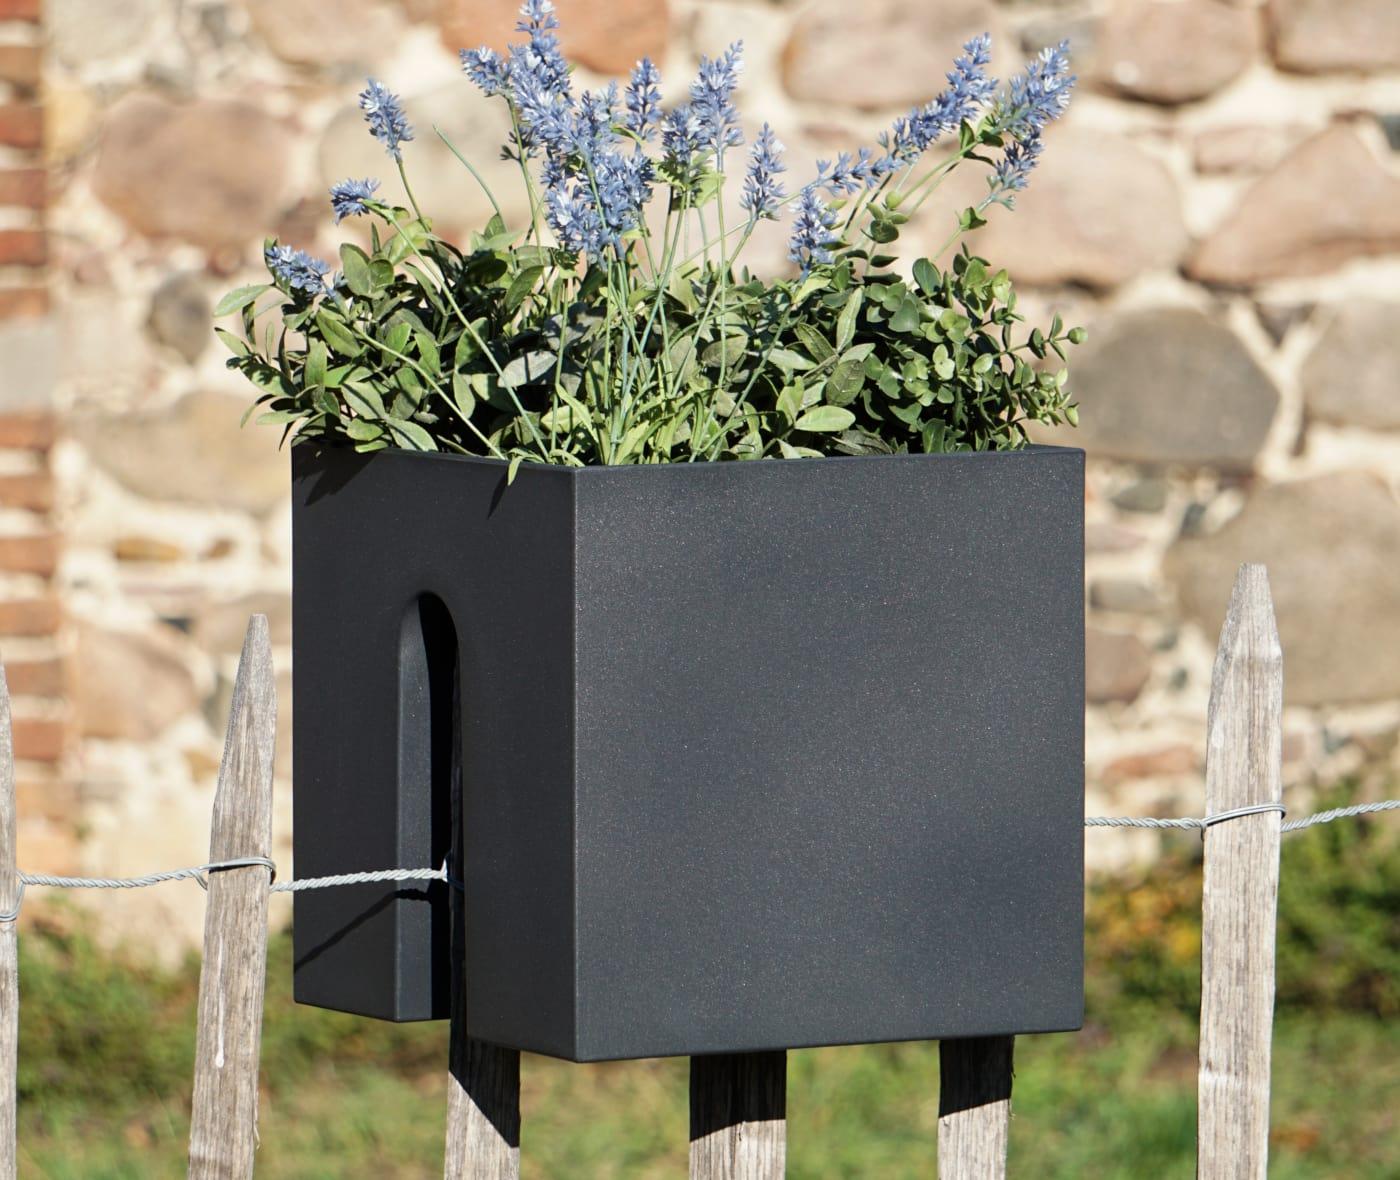 Rephorm Haus Steckling Cube